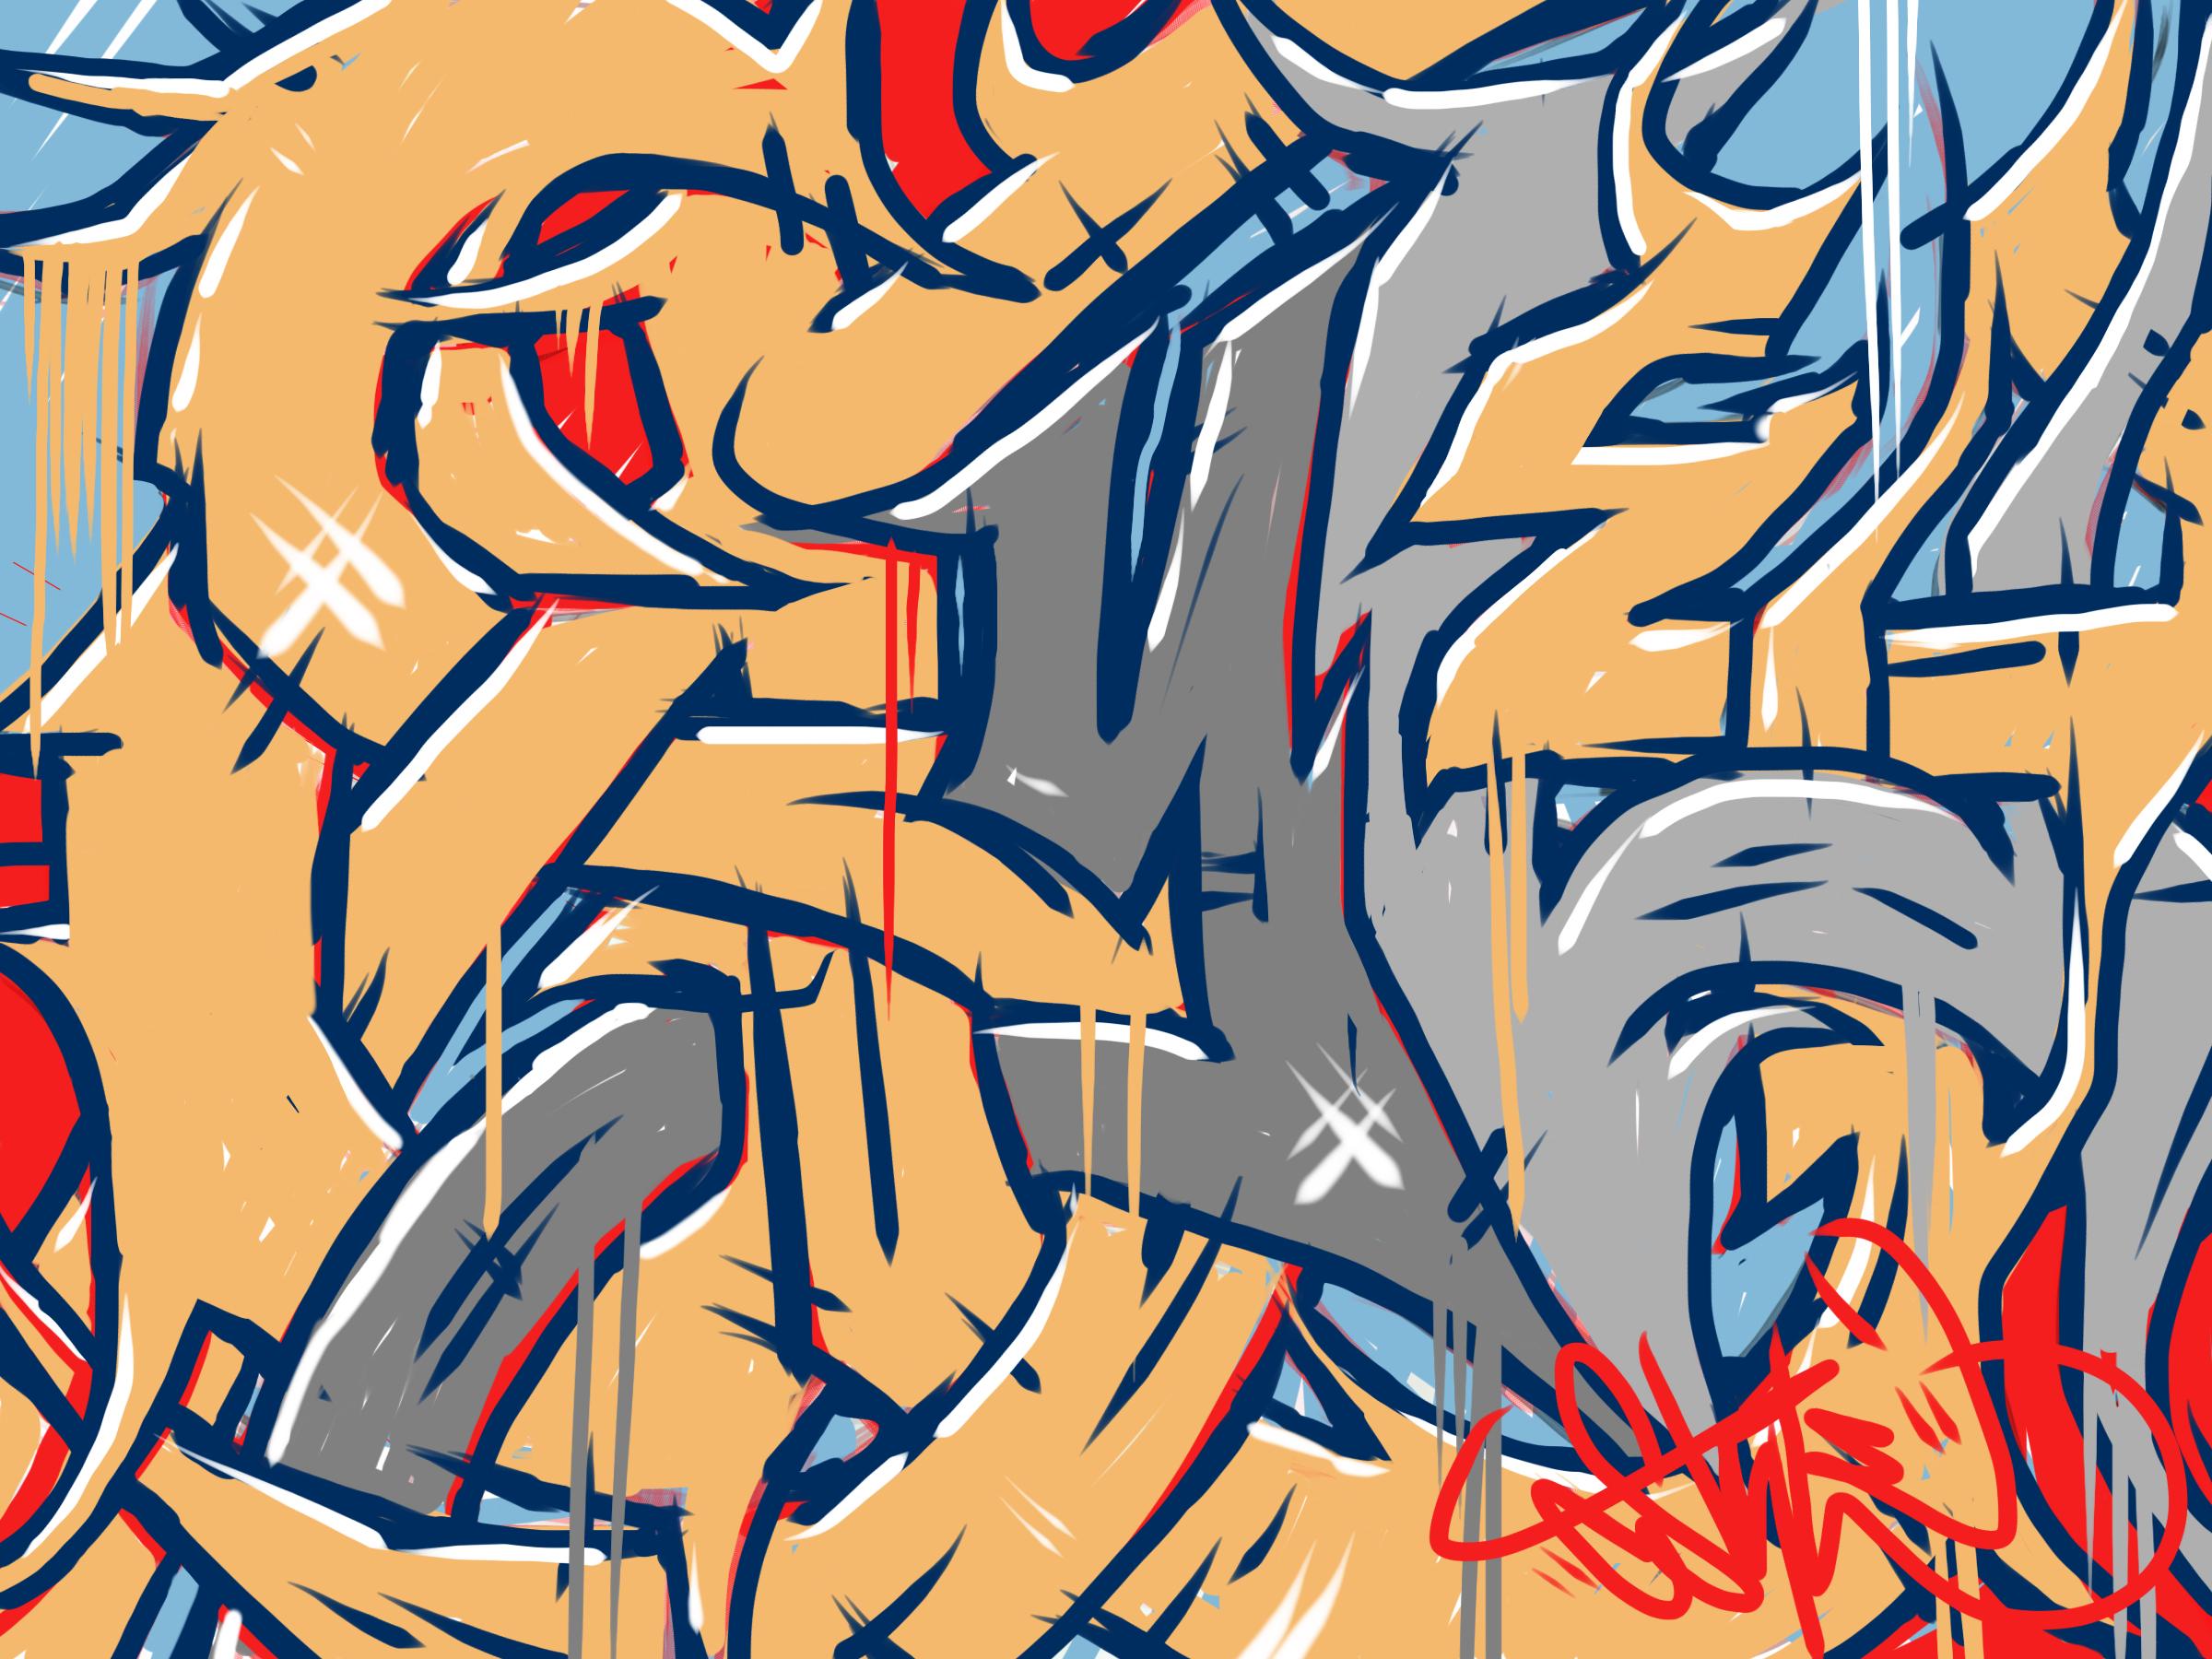 CStyle.SketchbookPro Quick paint. by c0nr4d